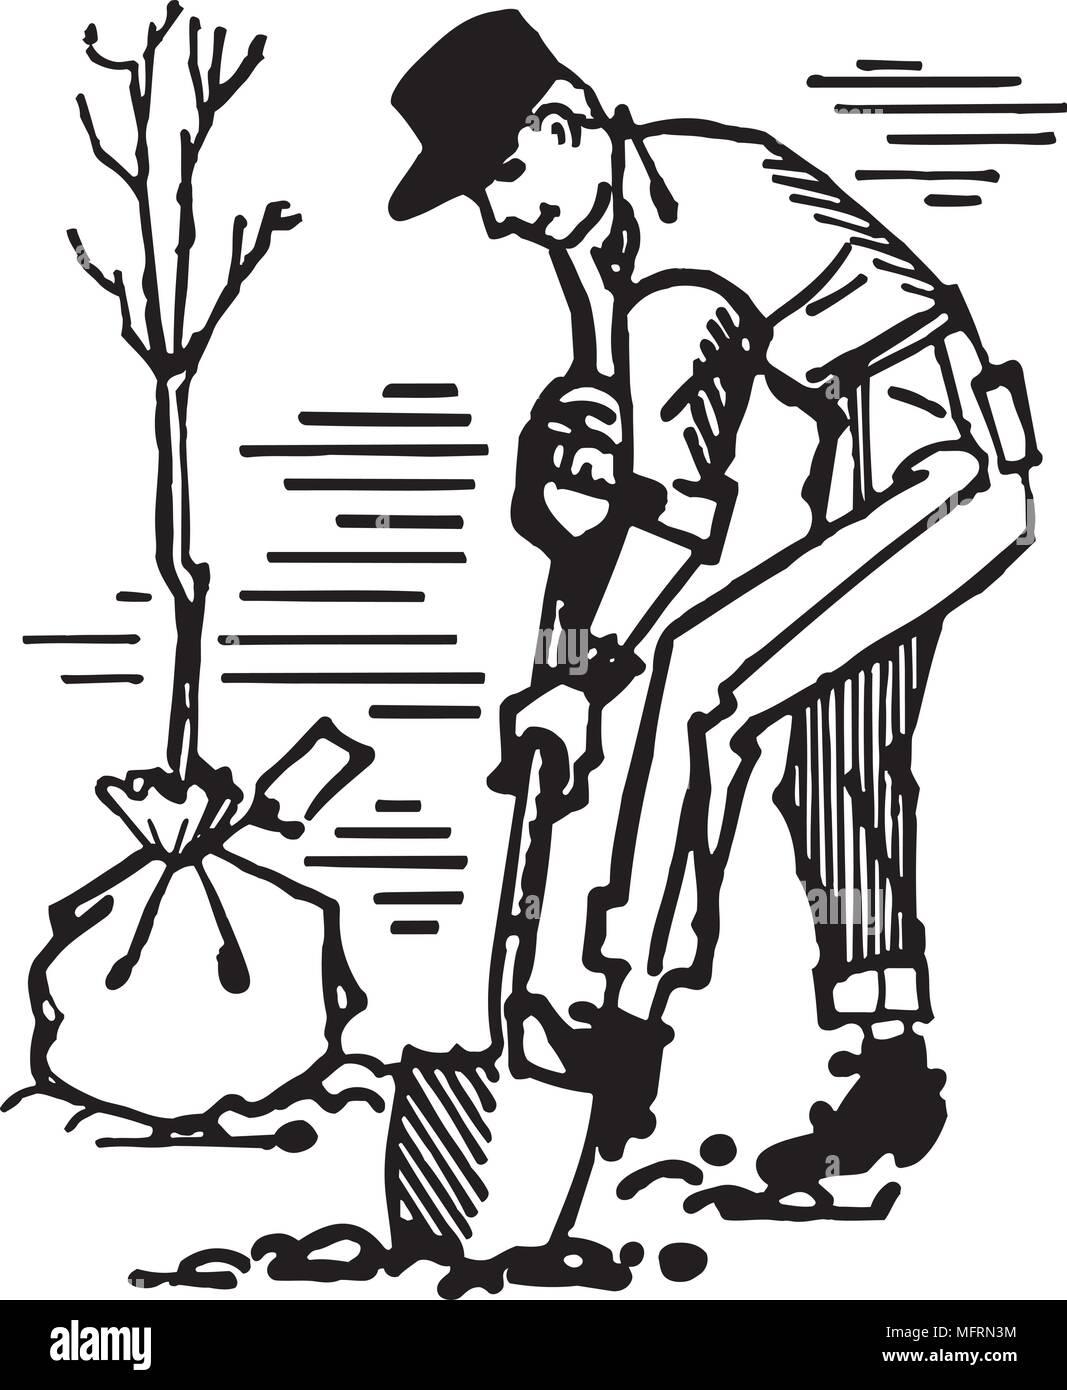 Man Planting Tree - Retro Clipart Illustration - Stock Image